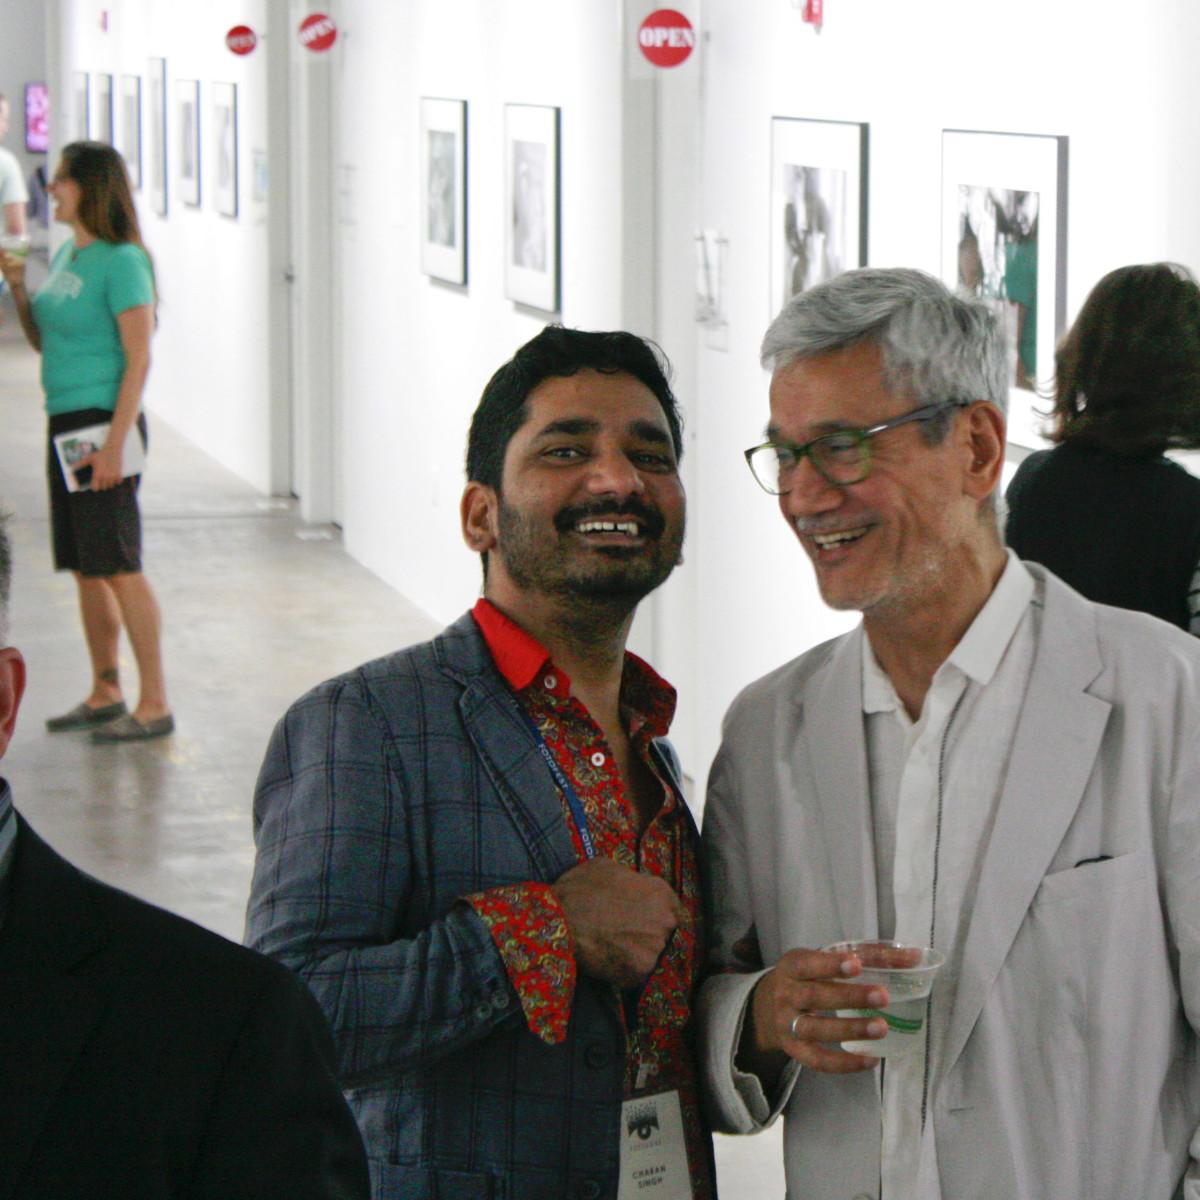 FotoFest Opening Charan Singh and Sunil Gupta